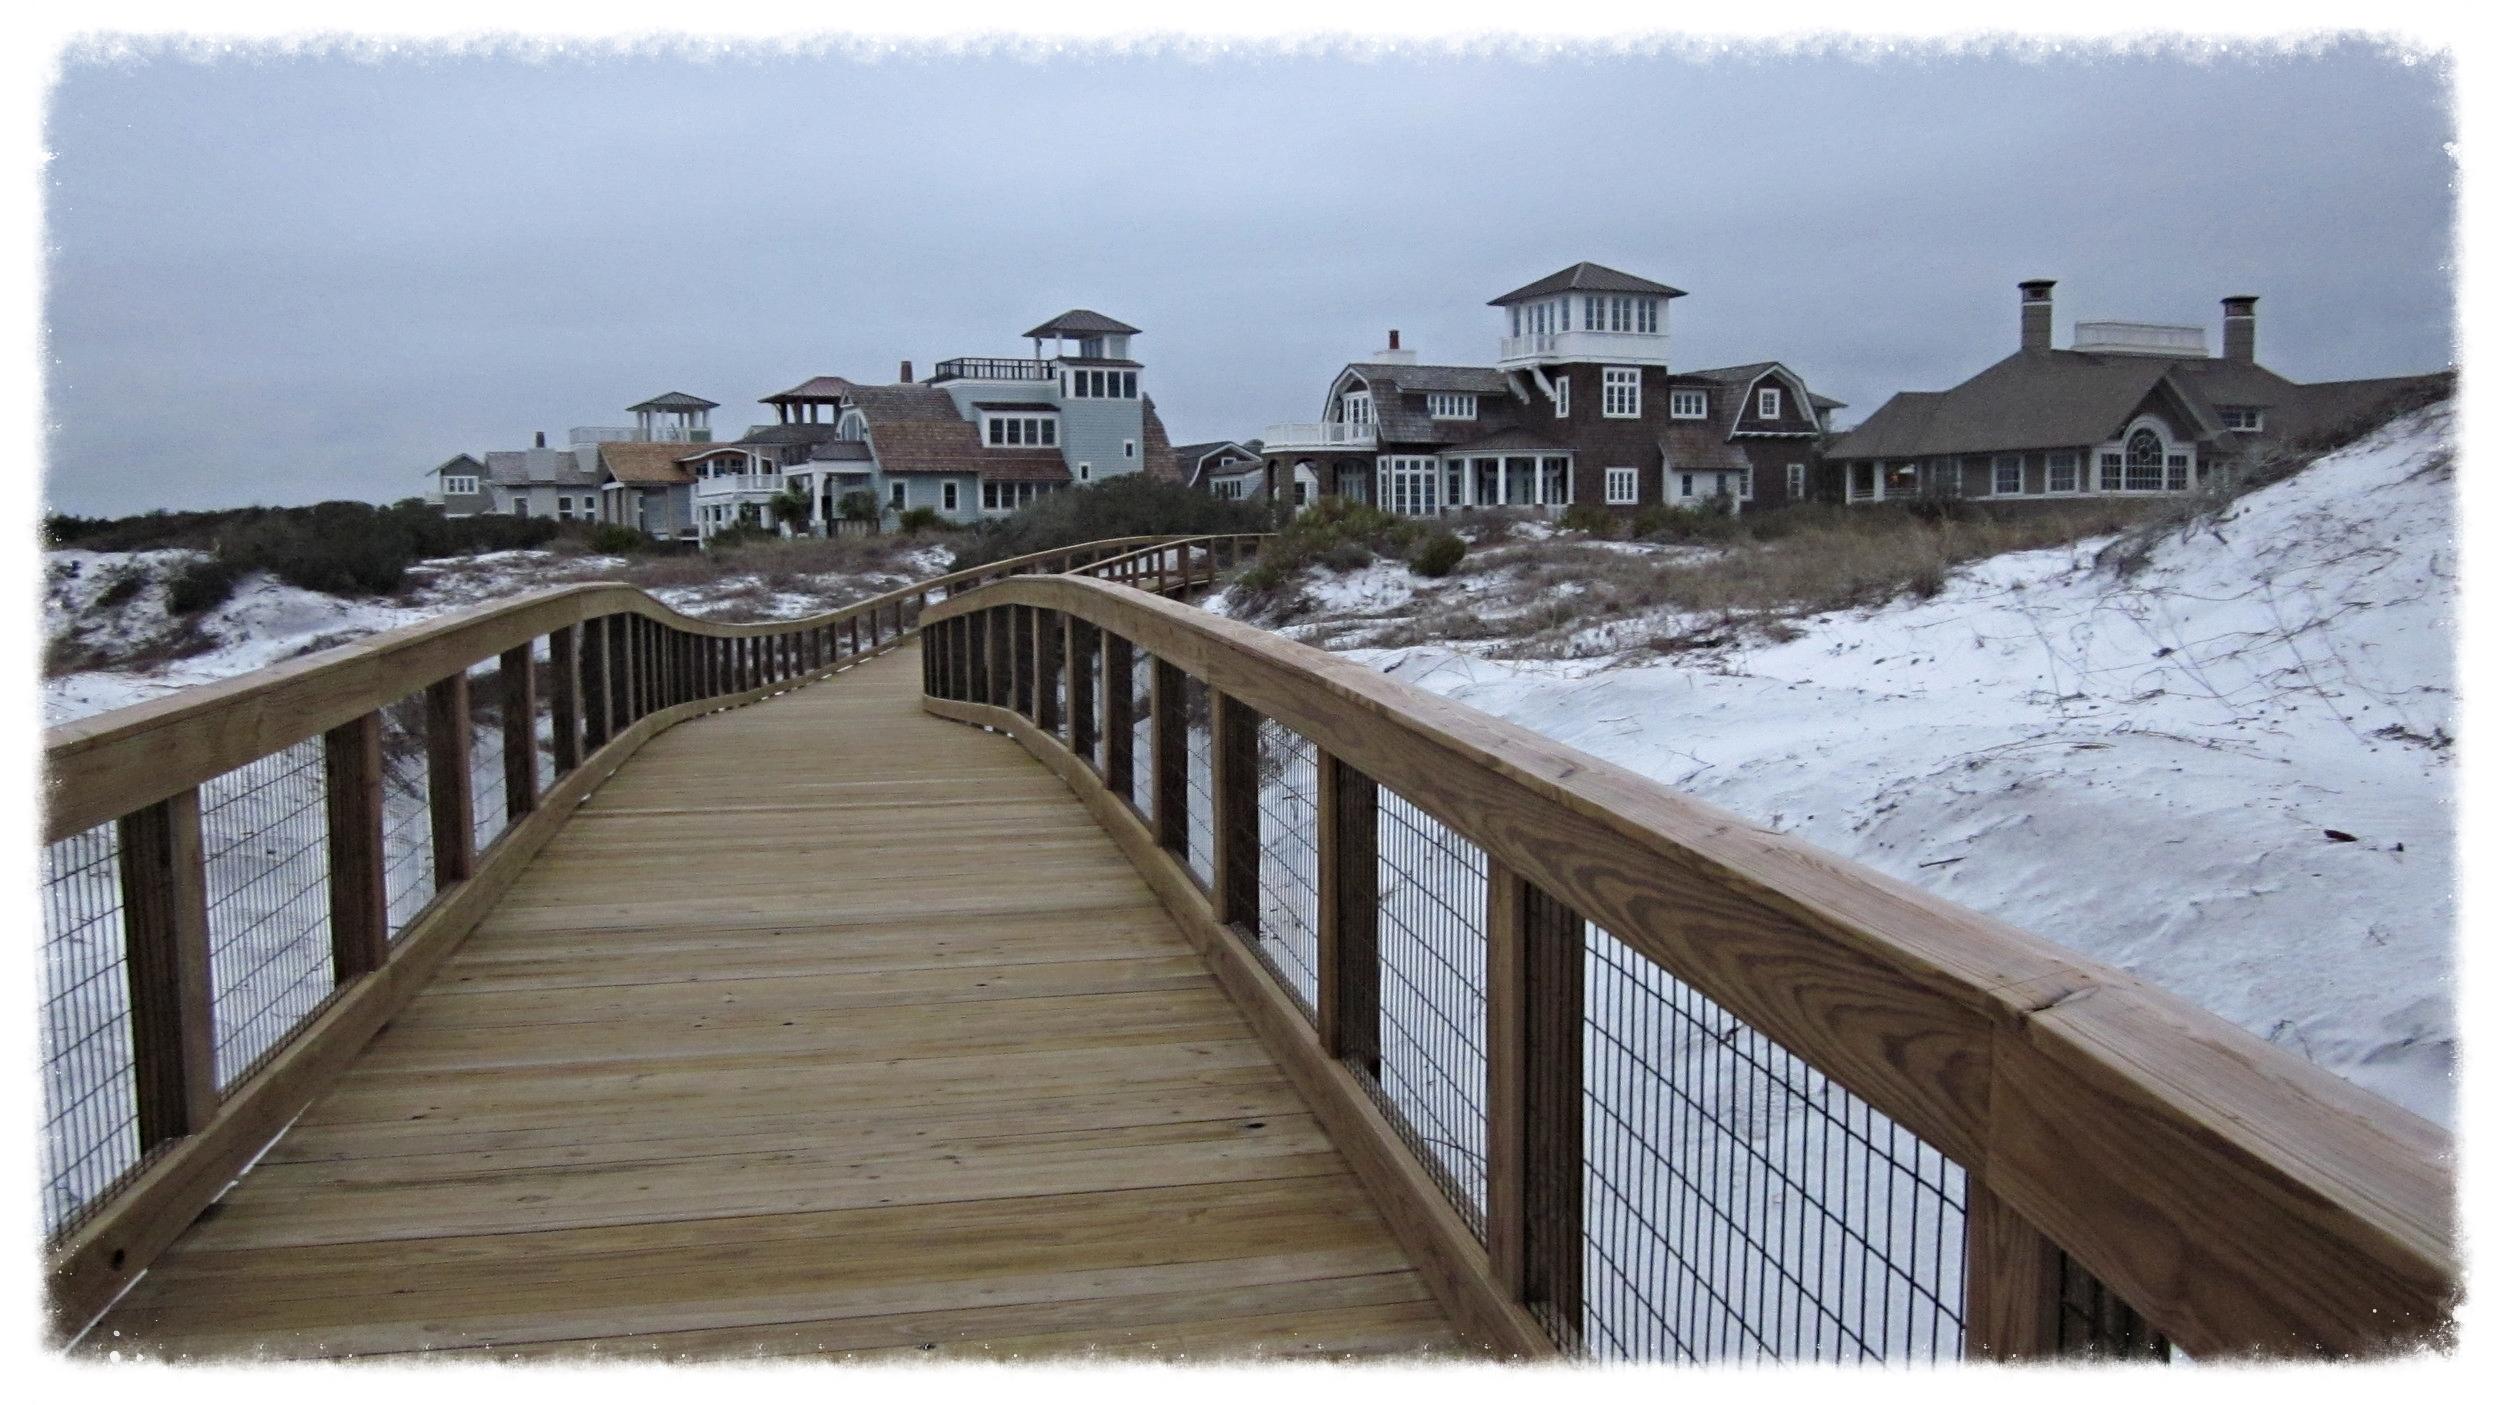 Wood Timber Boardwalk Construction